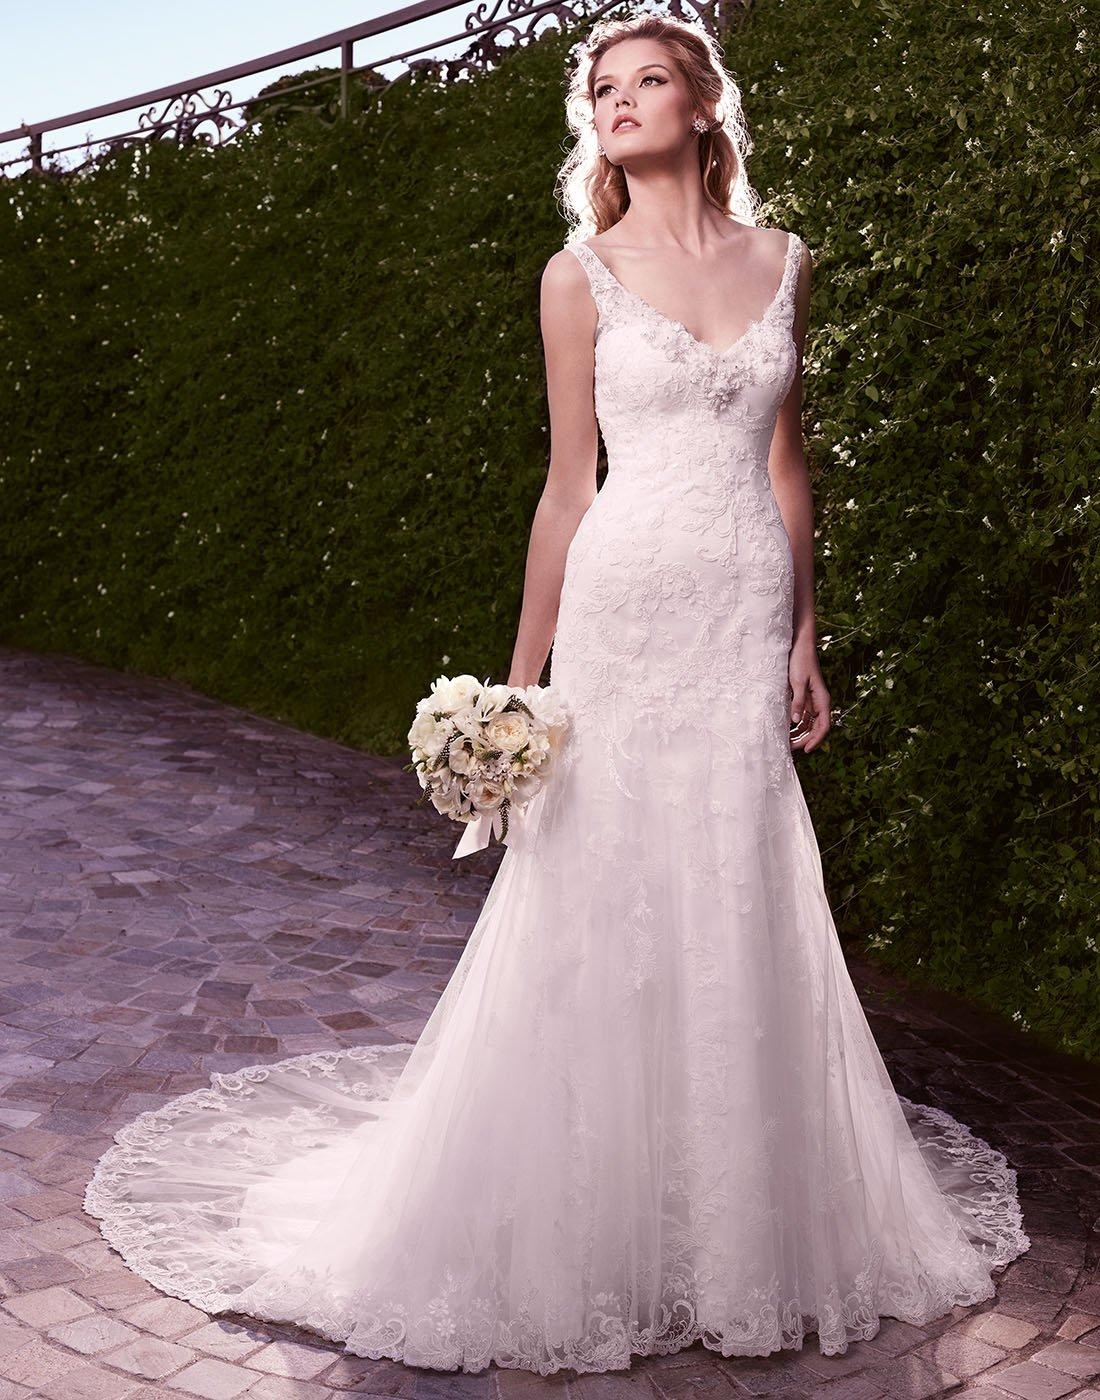 2135 Dopasowana Koronkowa Suknia ślubna Evita